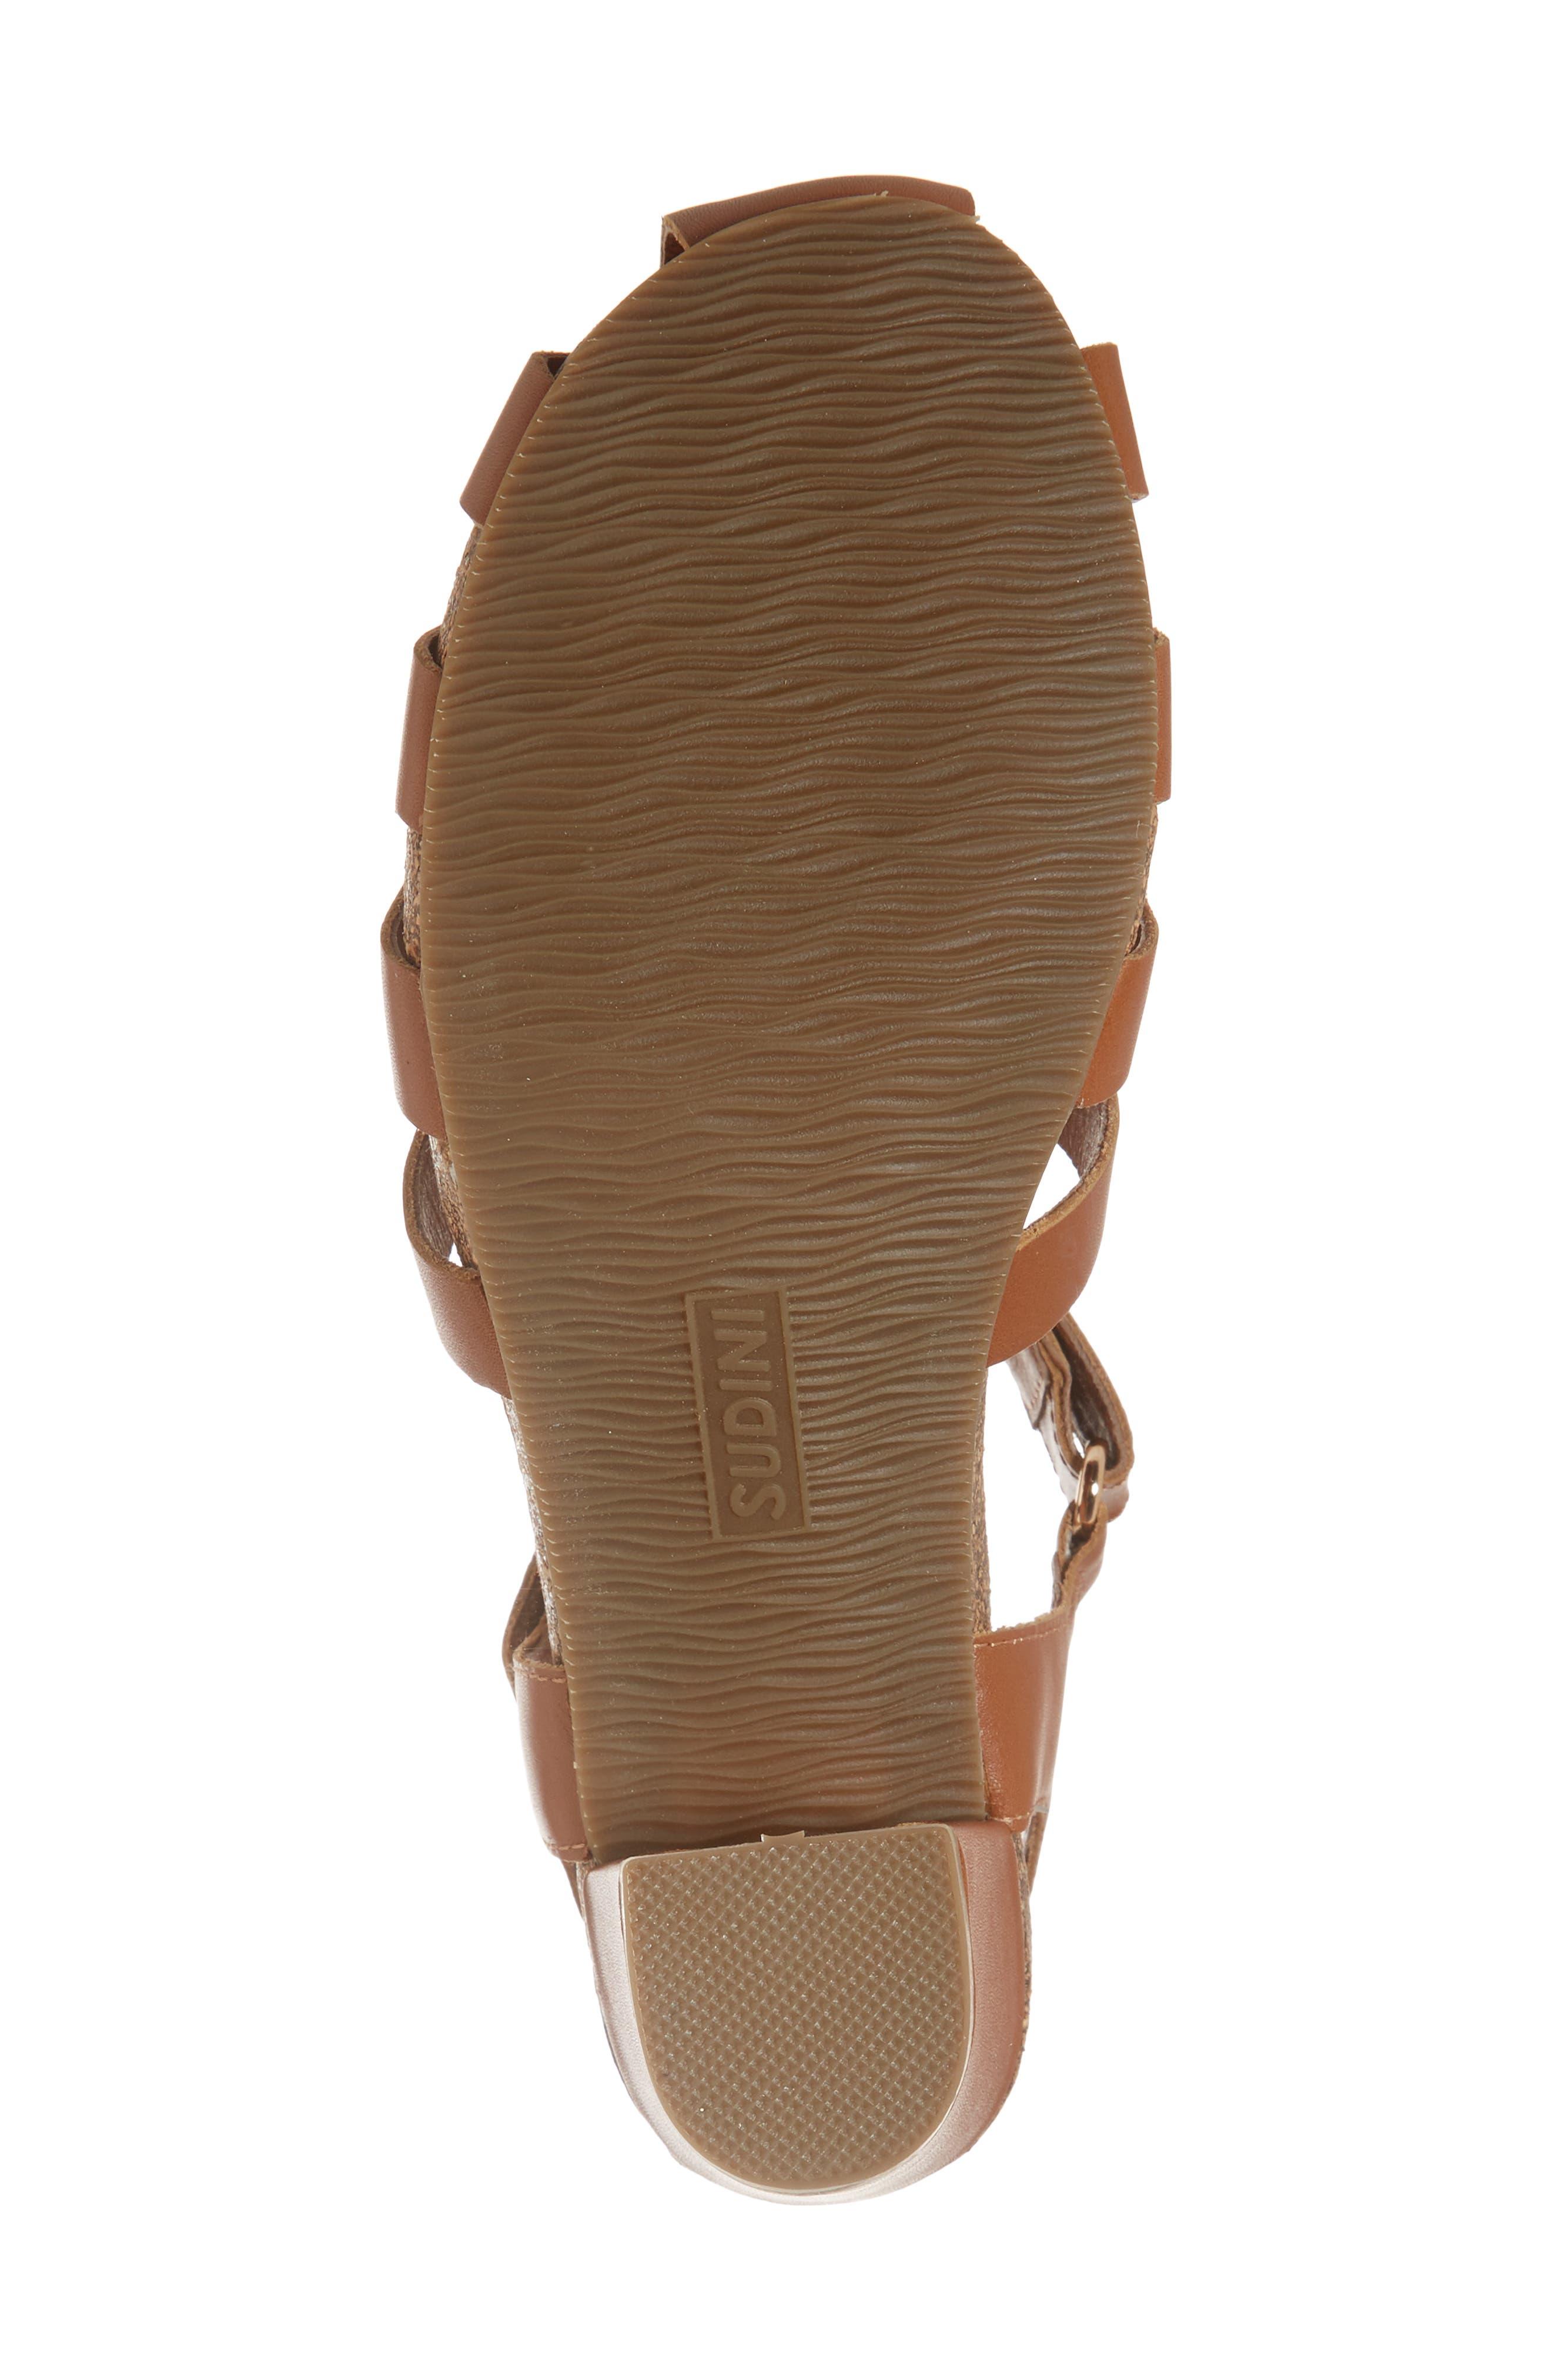 Carrara Block Heel Sandal,                             Alternate thumbnail 6, color,                             Cognac Leather